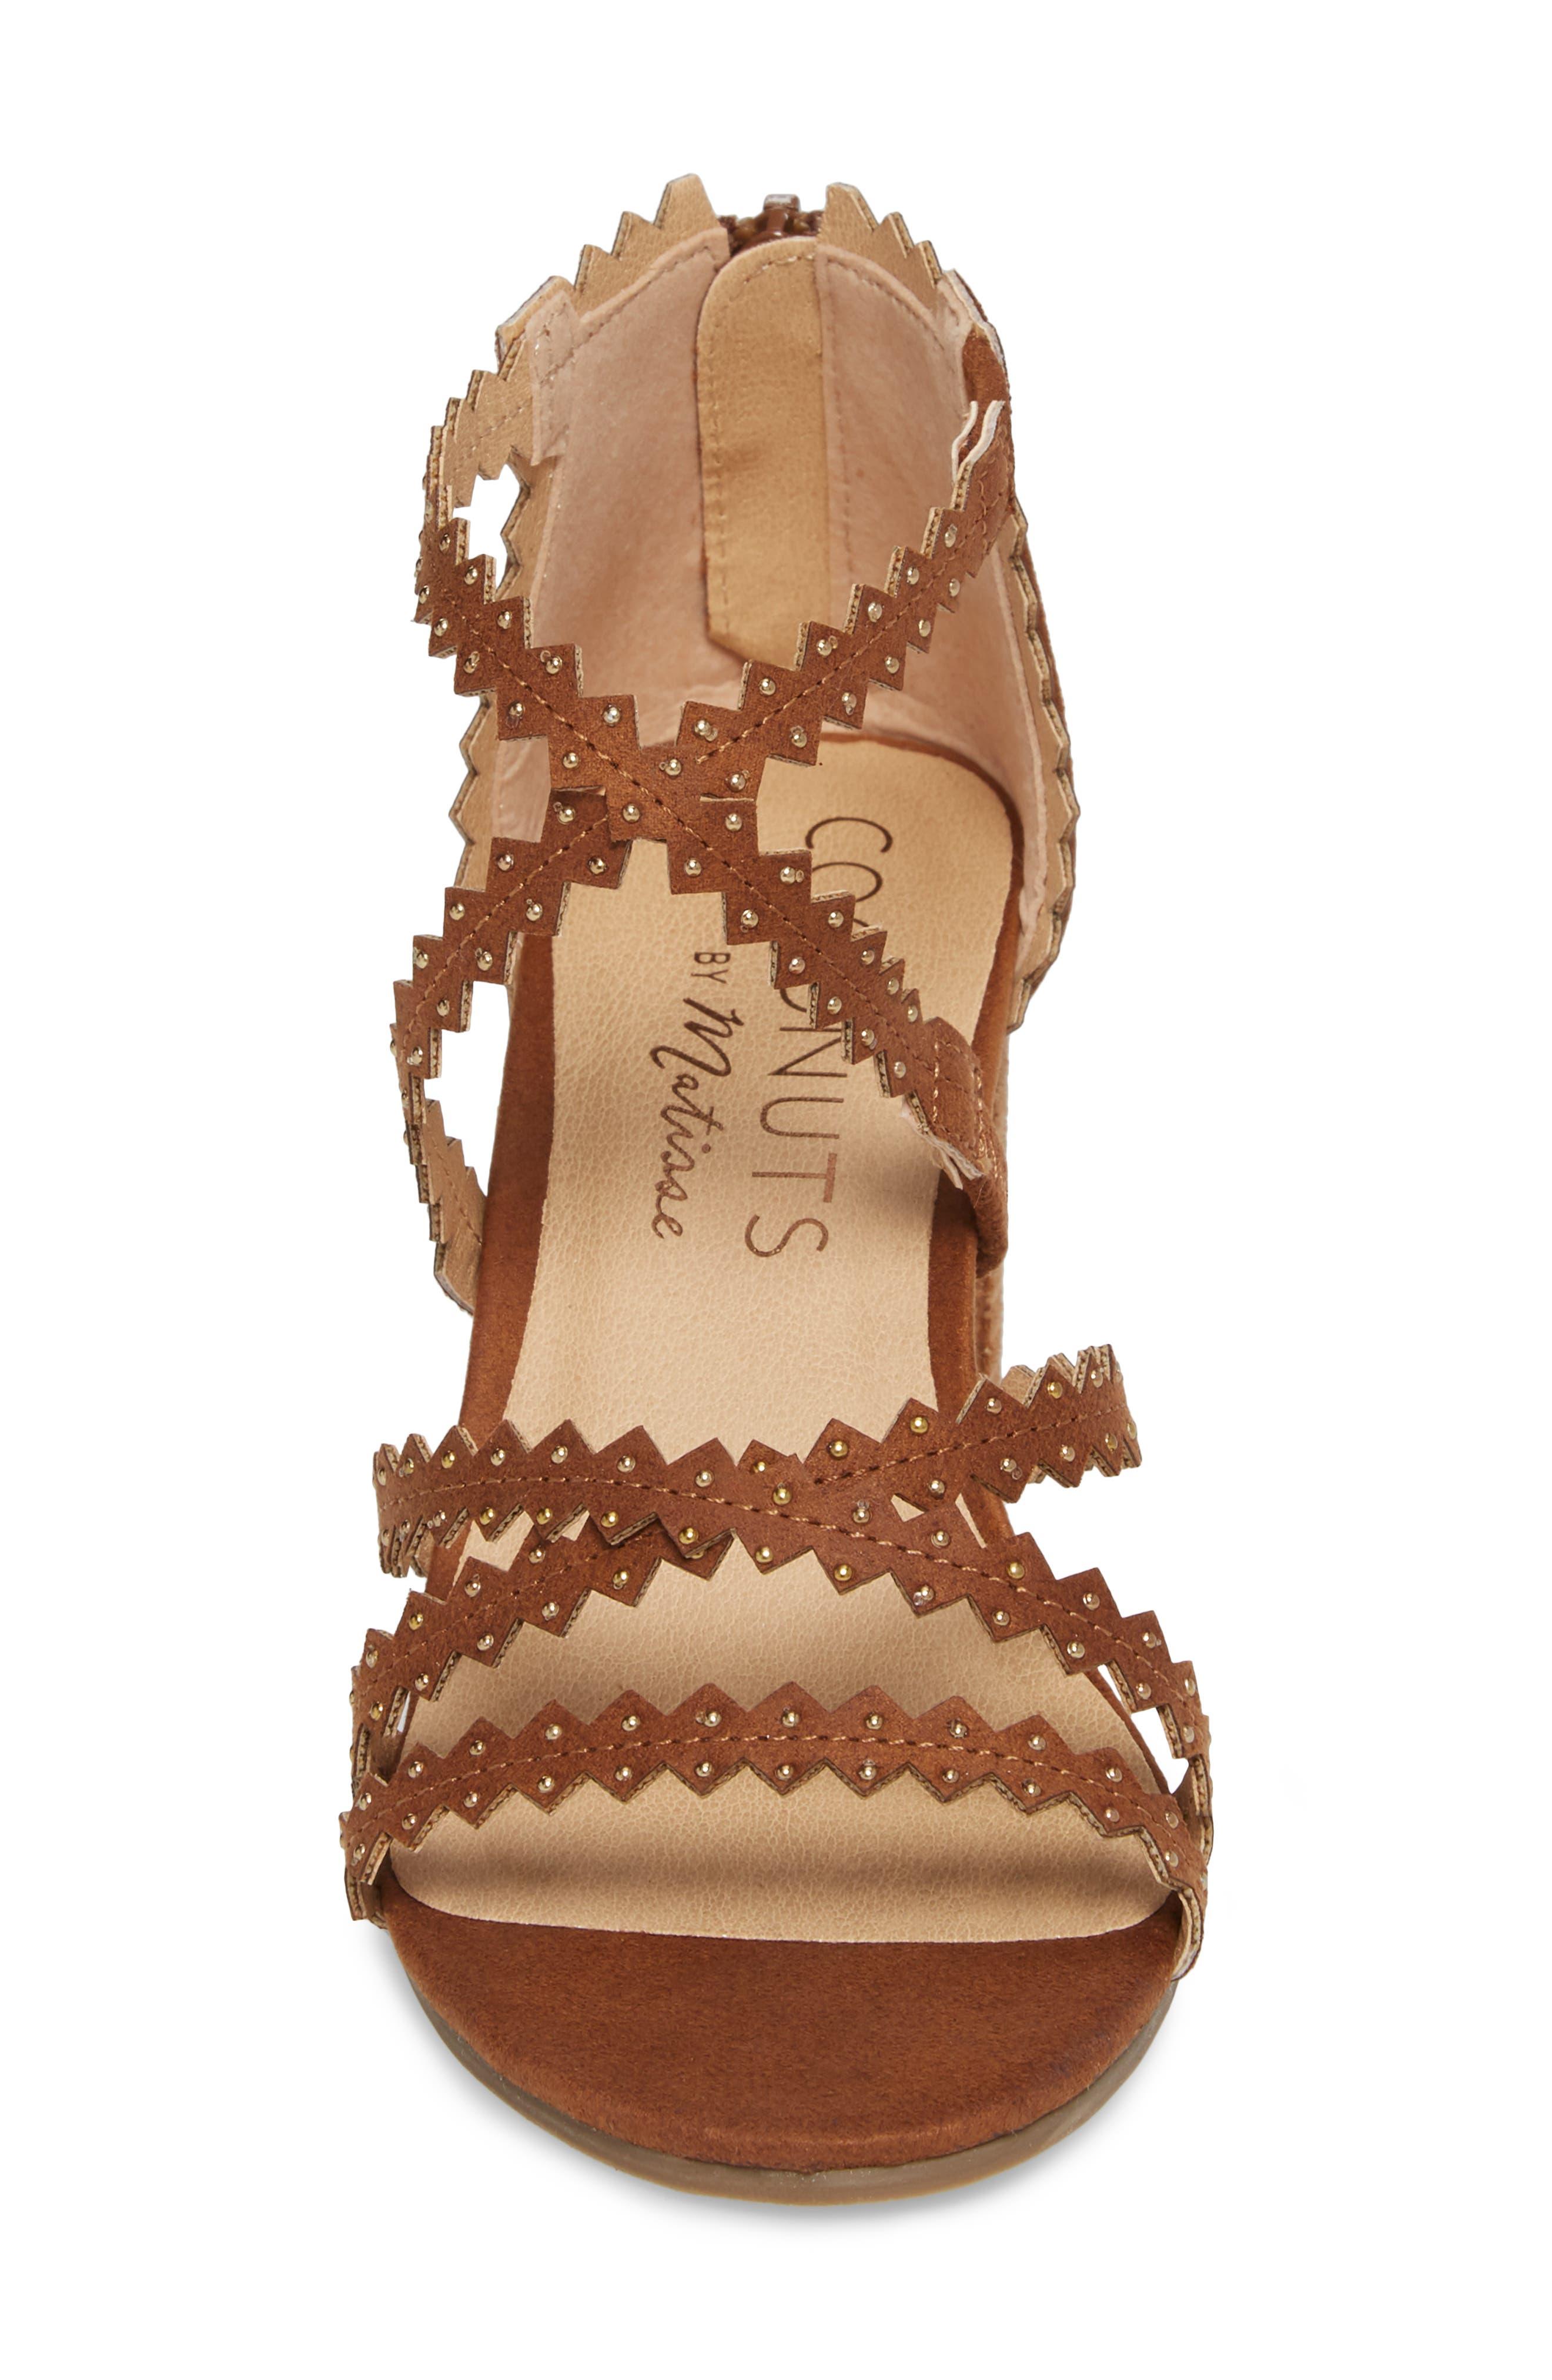 Aiden Block Heel Sandal,                             Alternate thumbnail 4, color,                             SADDLE SUEDE